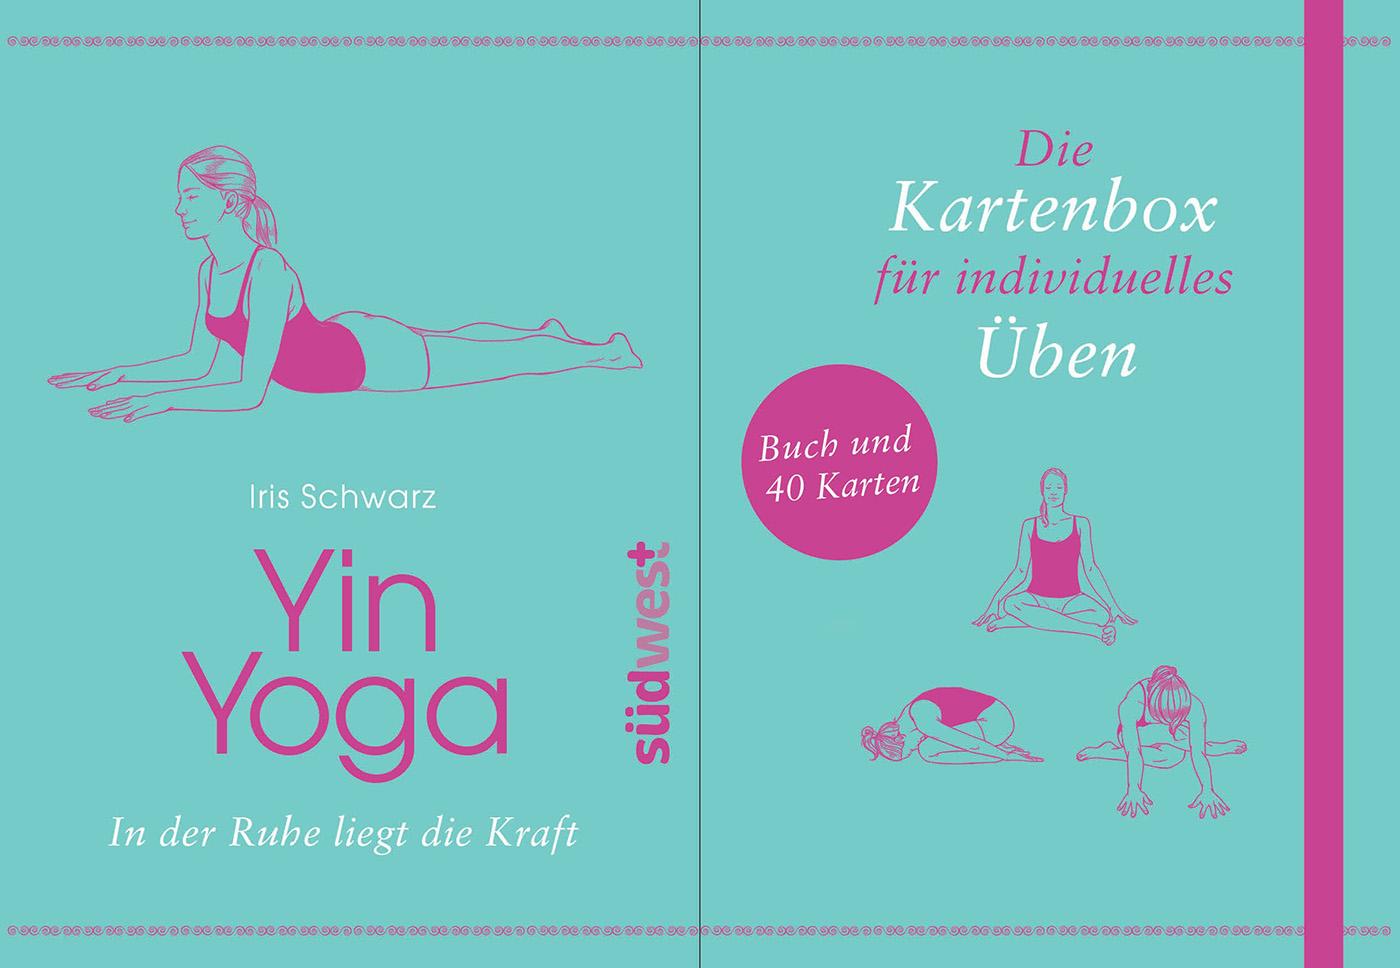 Yin Yoga Kartenbox von Iris Schwarz